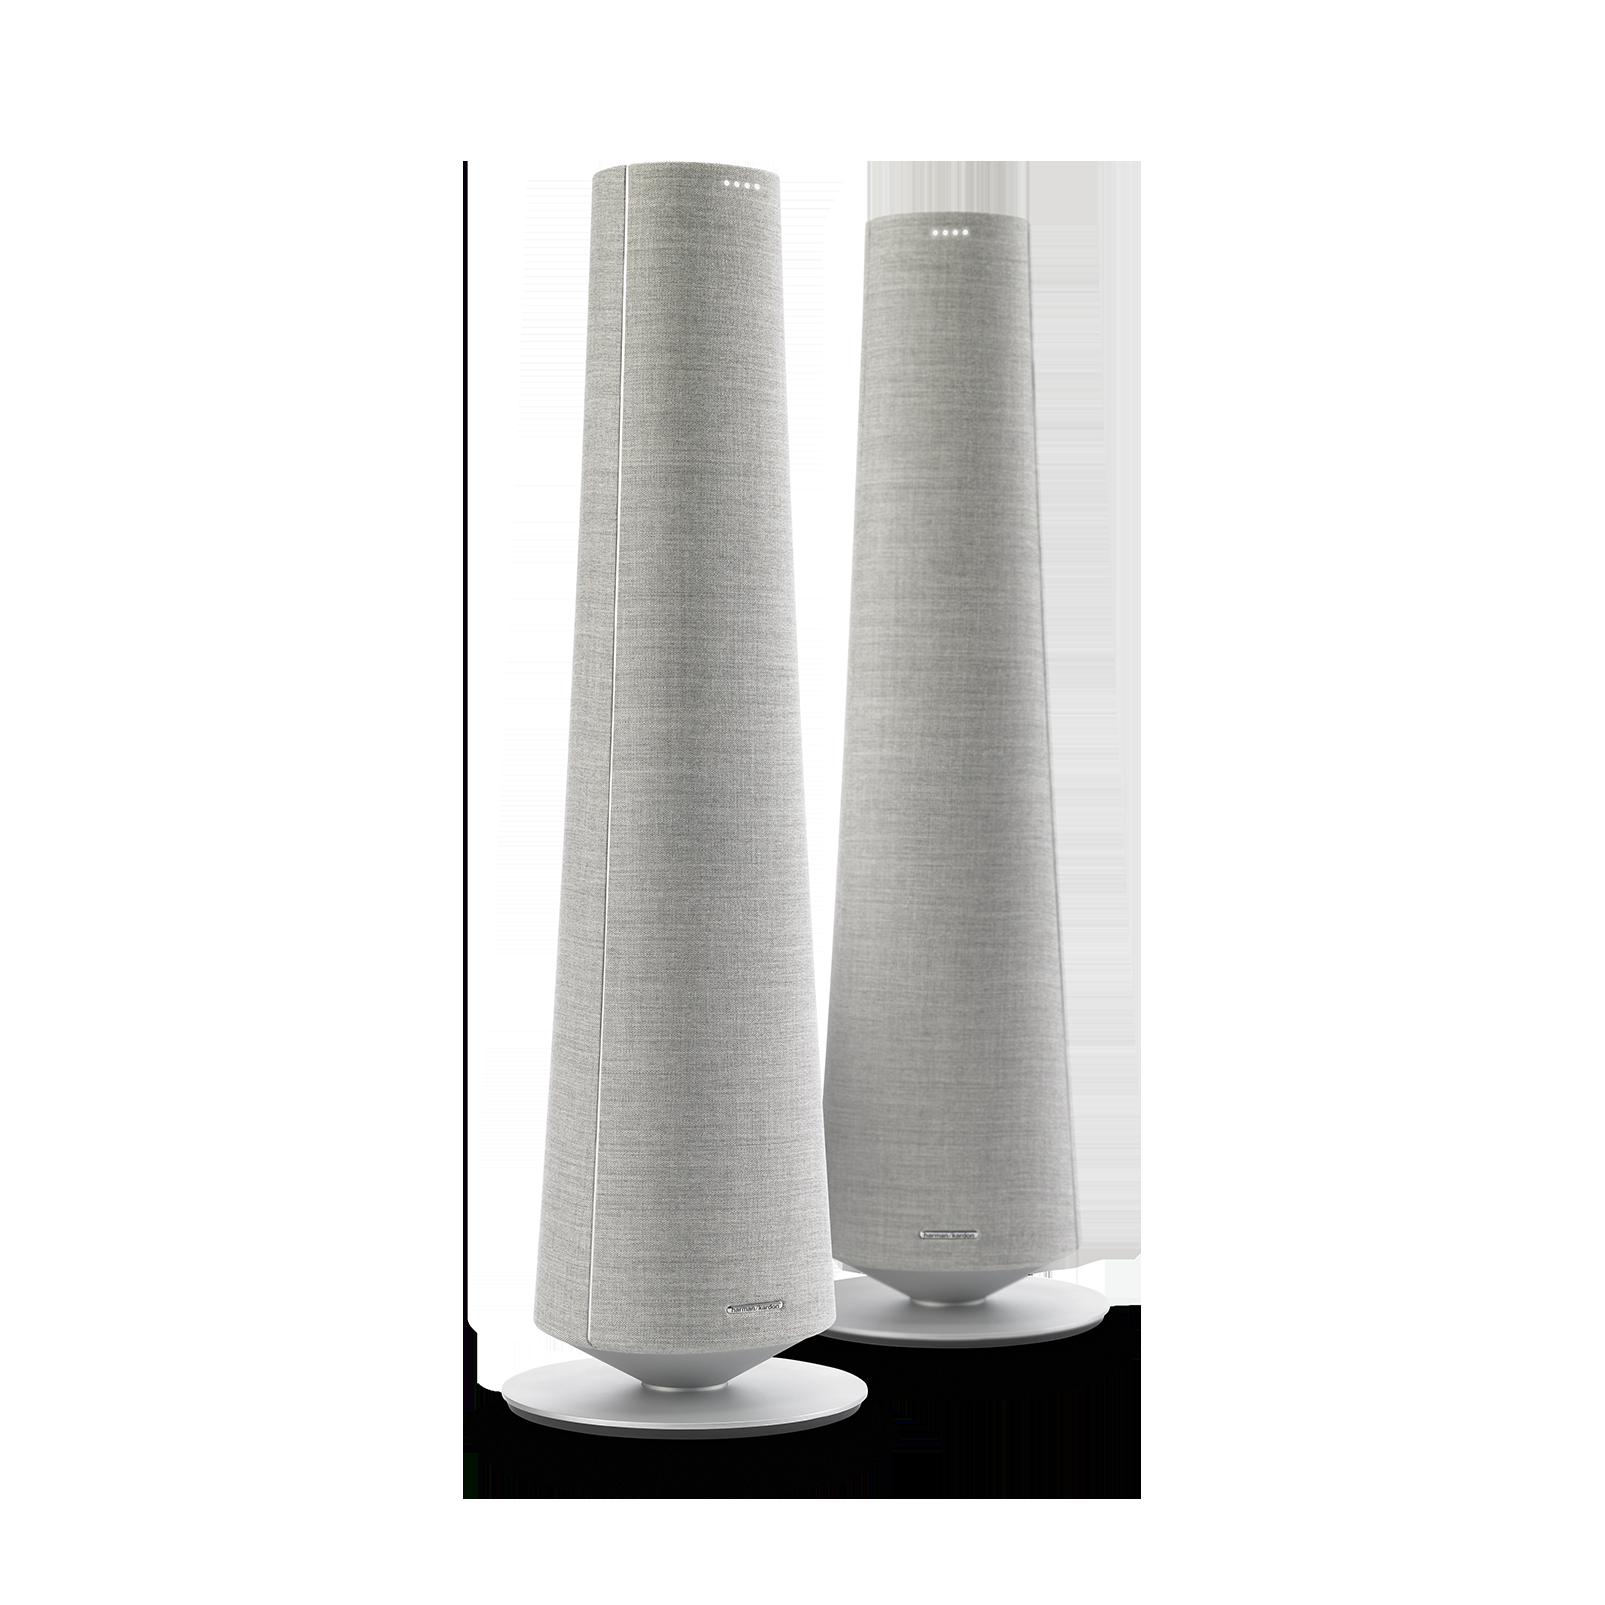 Harman Kardon Citation Tower - Grey - Smart Premium Floorstanding Speaker that delivers an impactful performance - Hero